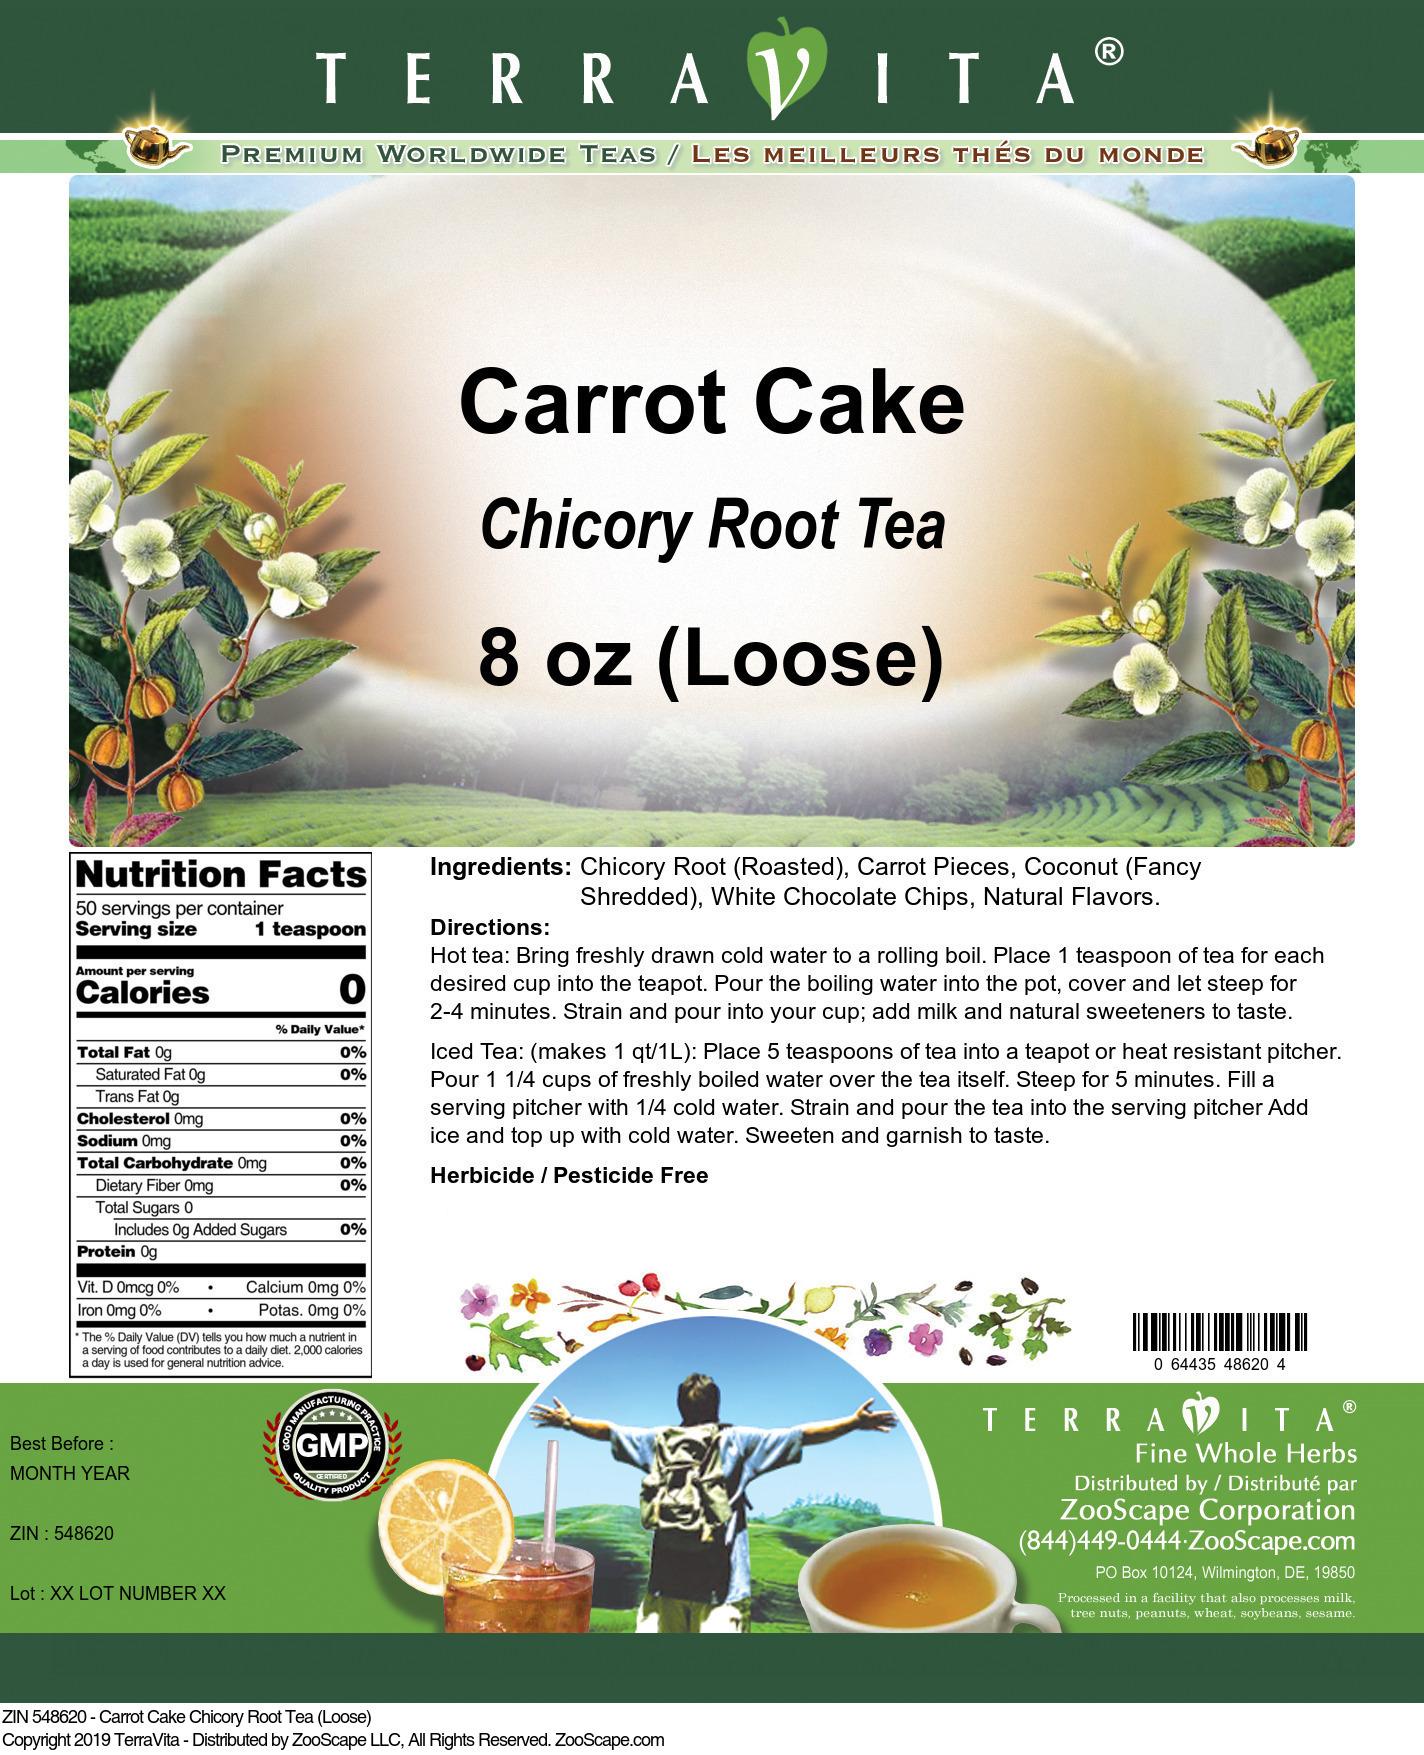 Carrot Cake Chicory Root